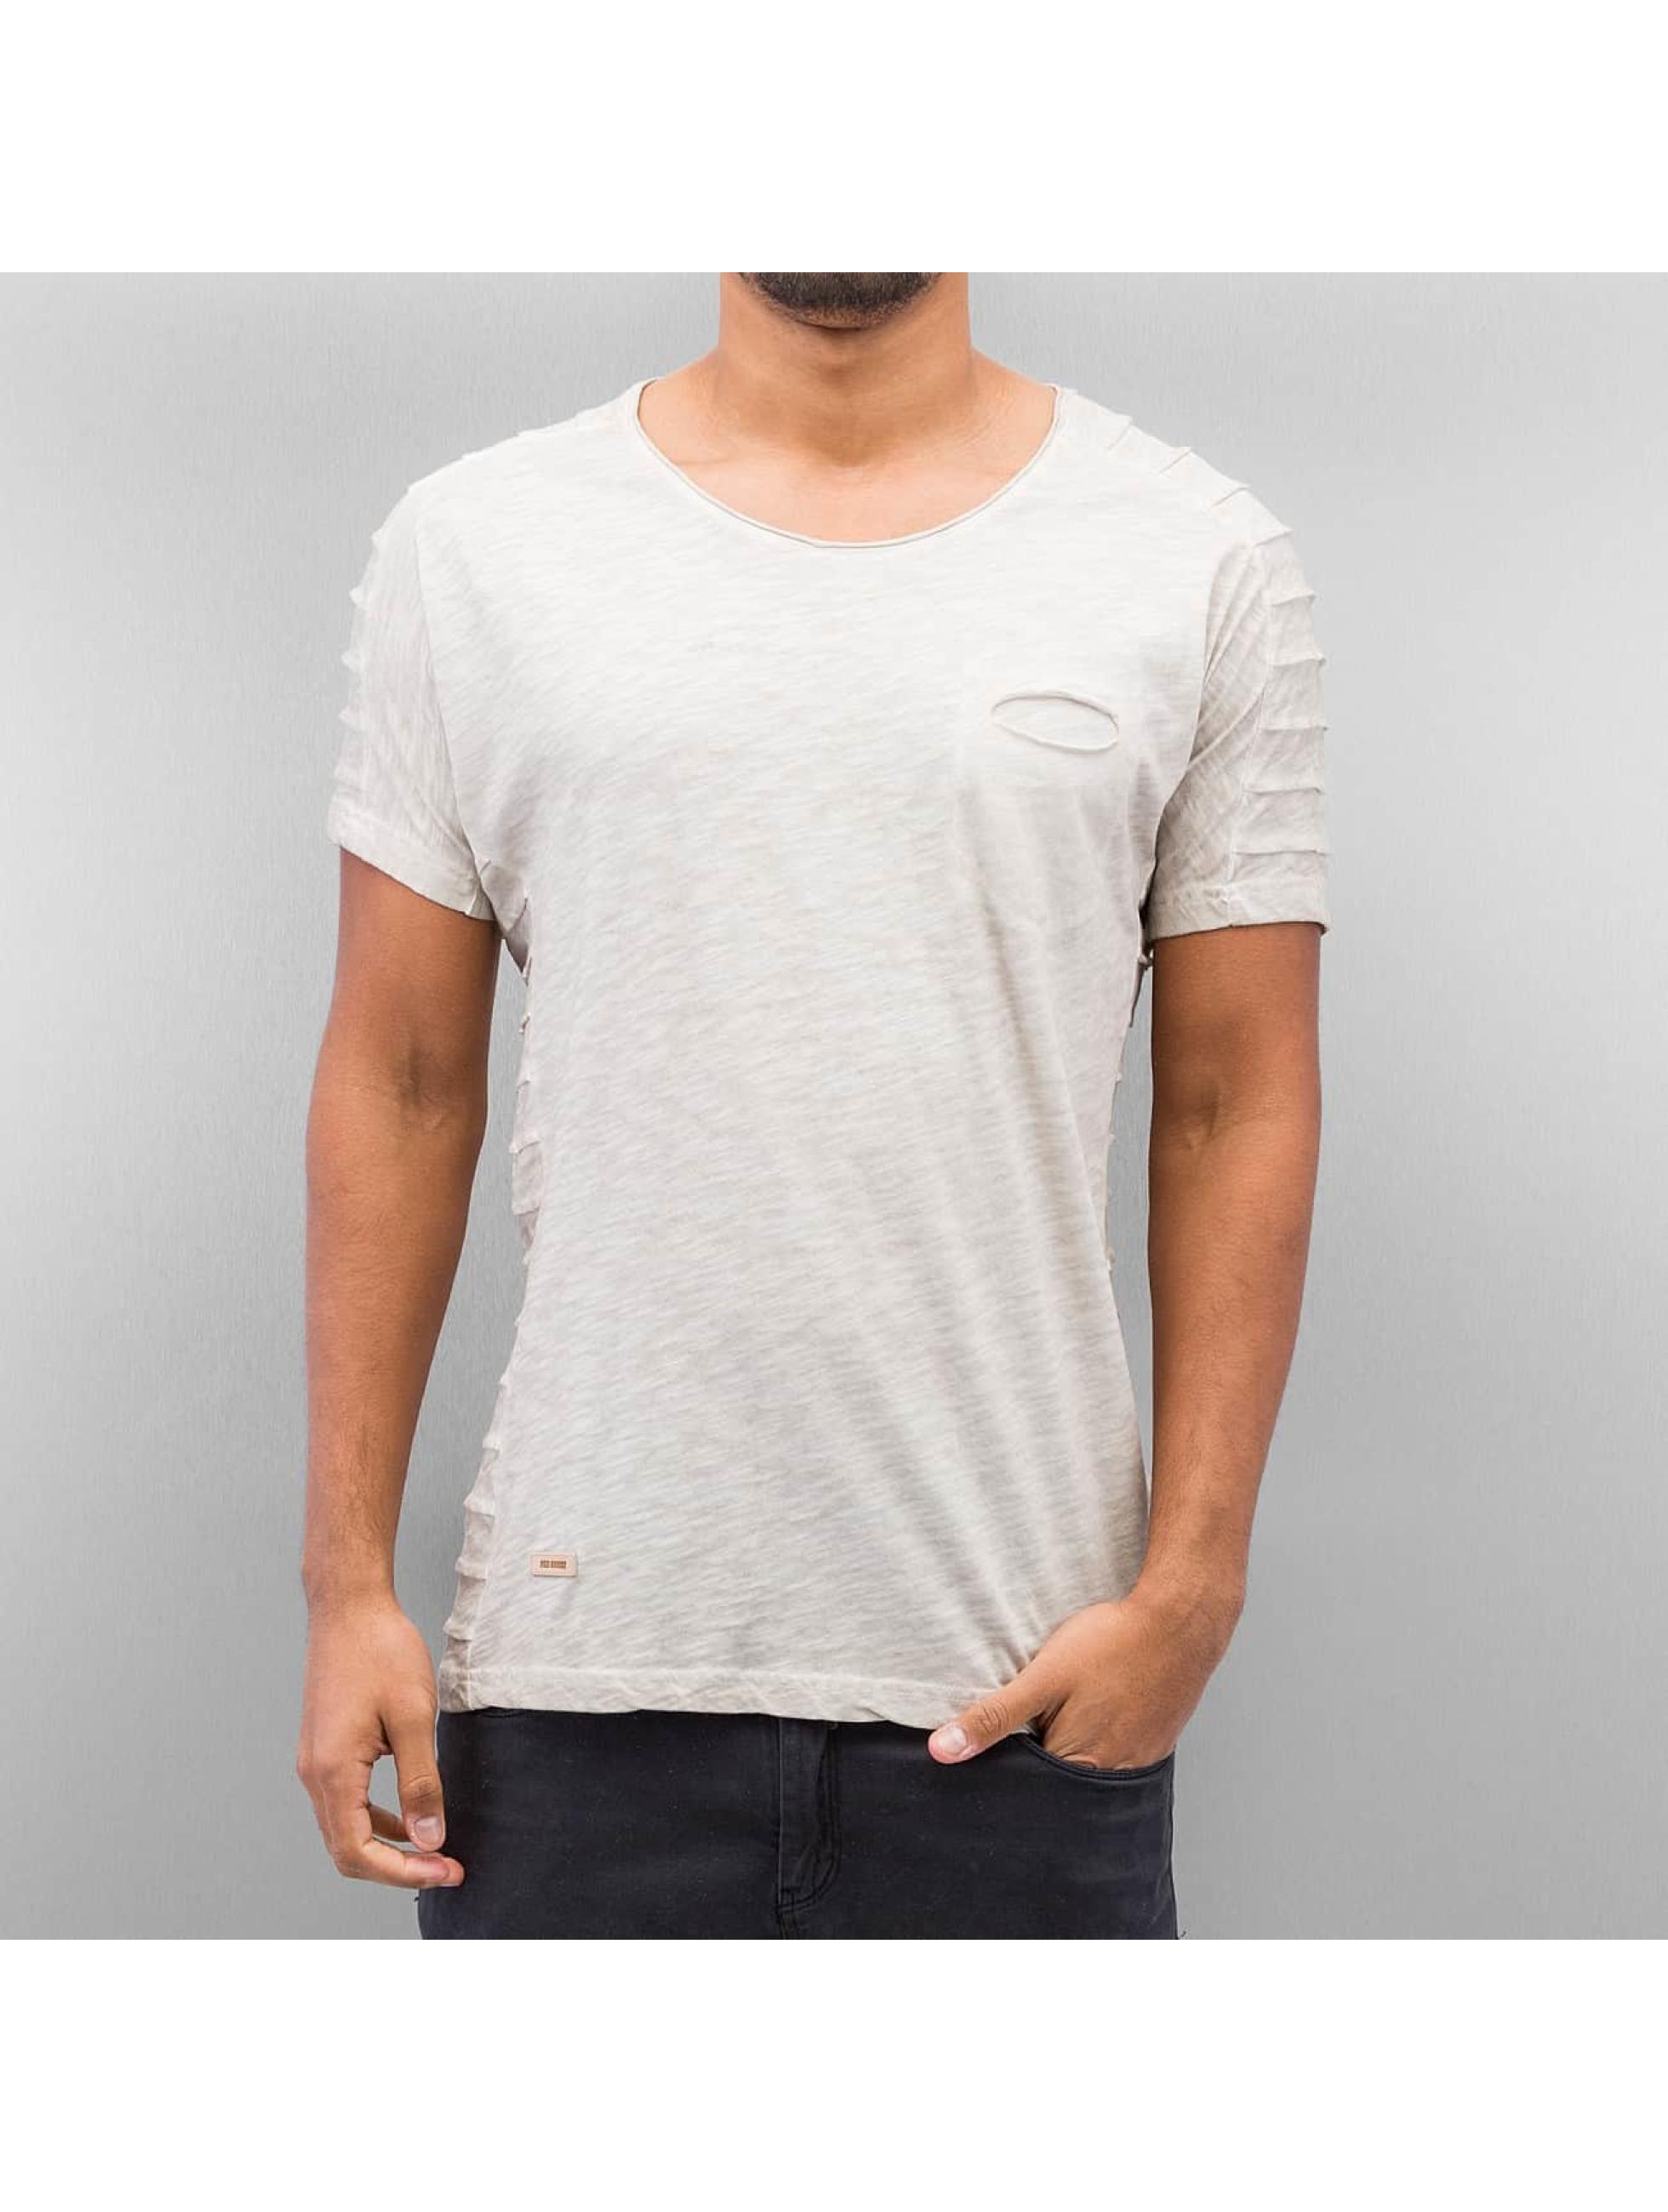 Red Bridge T-Shirt Pocket gray